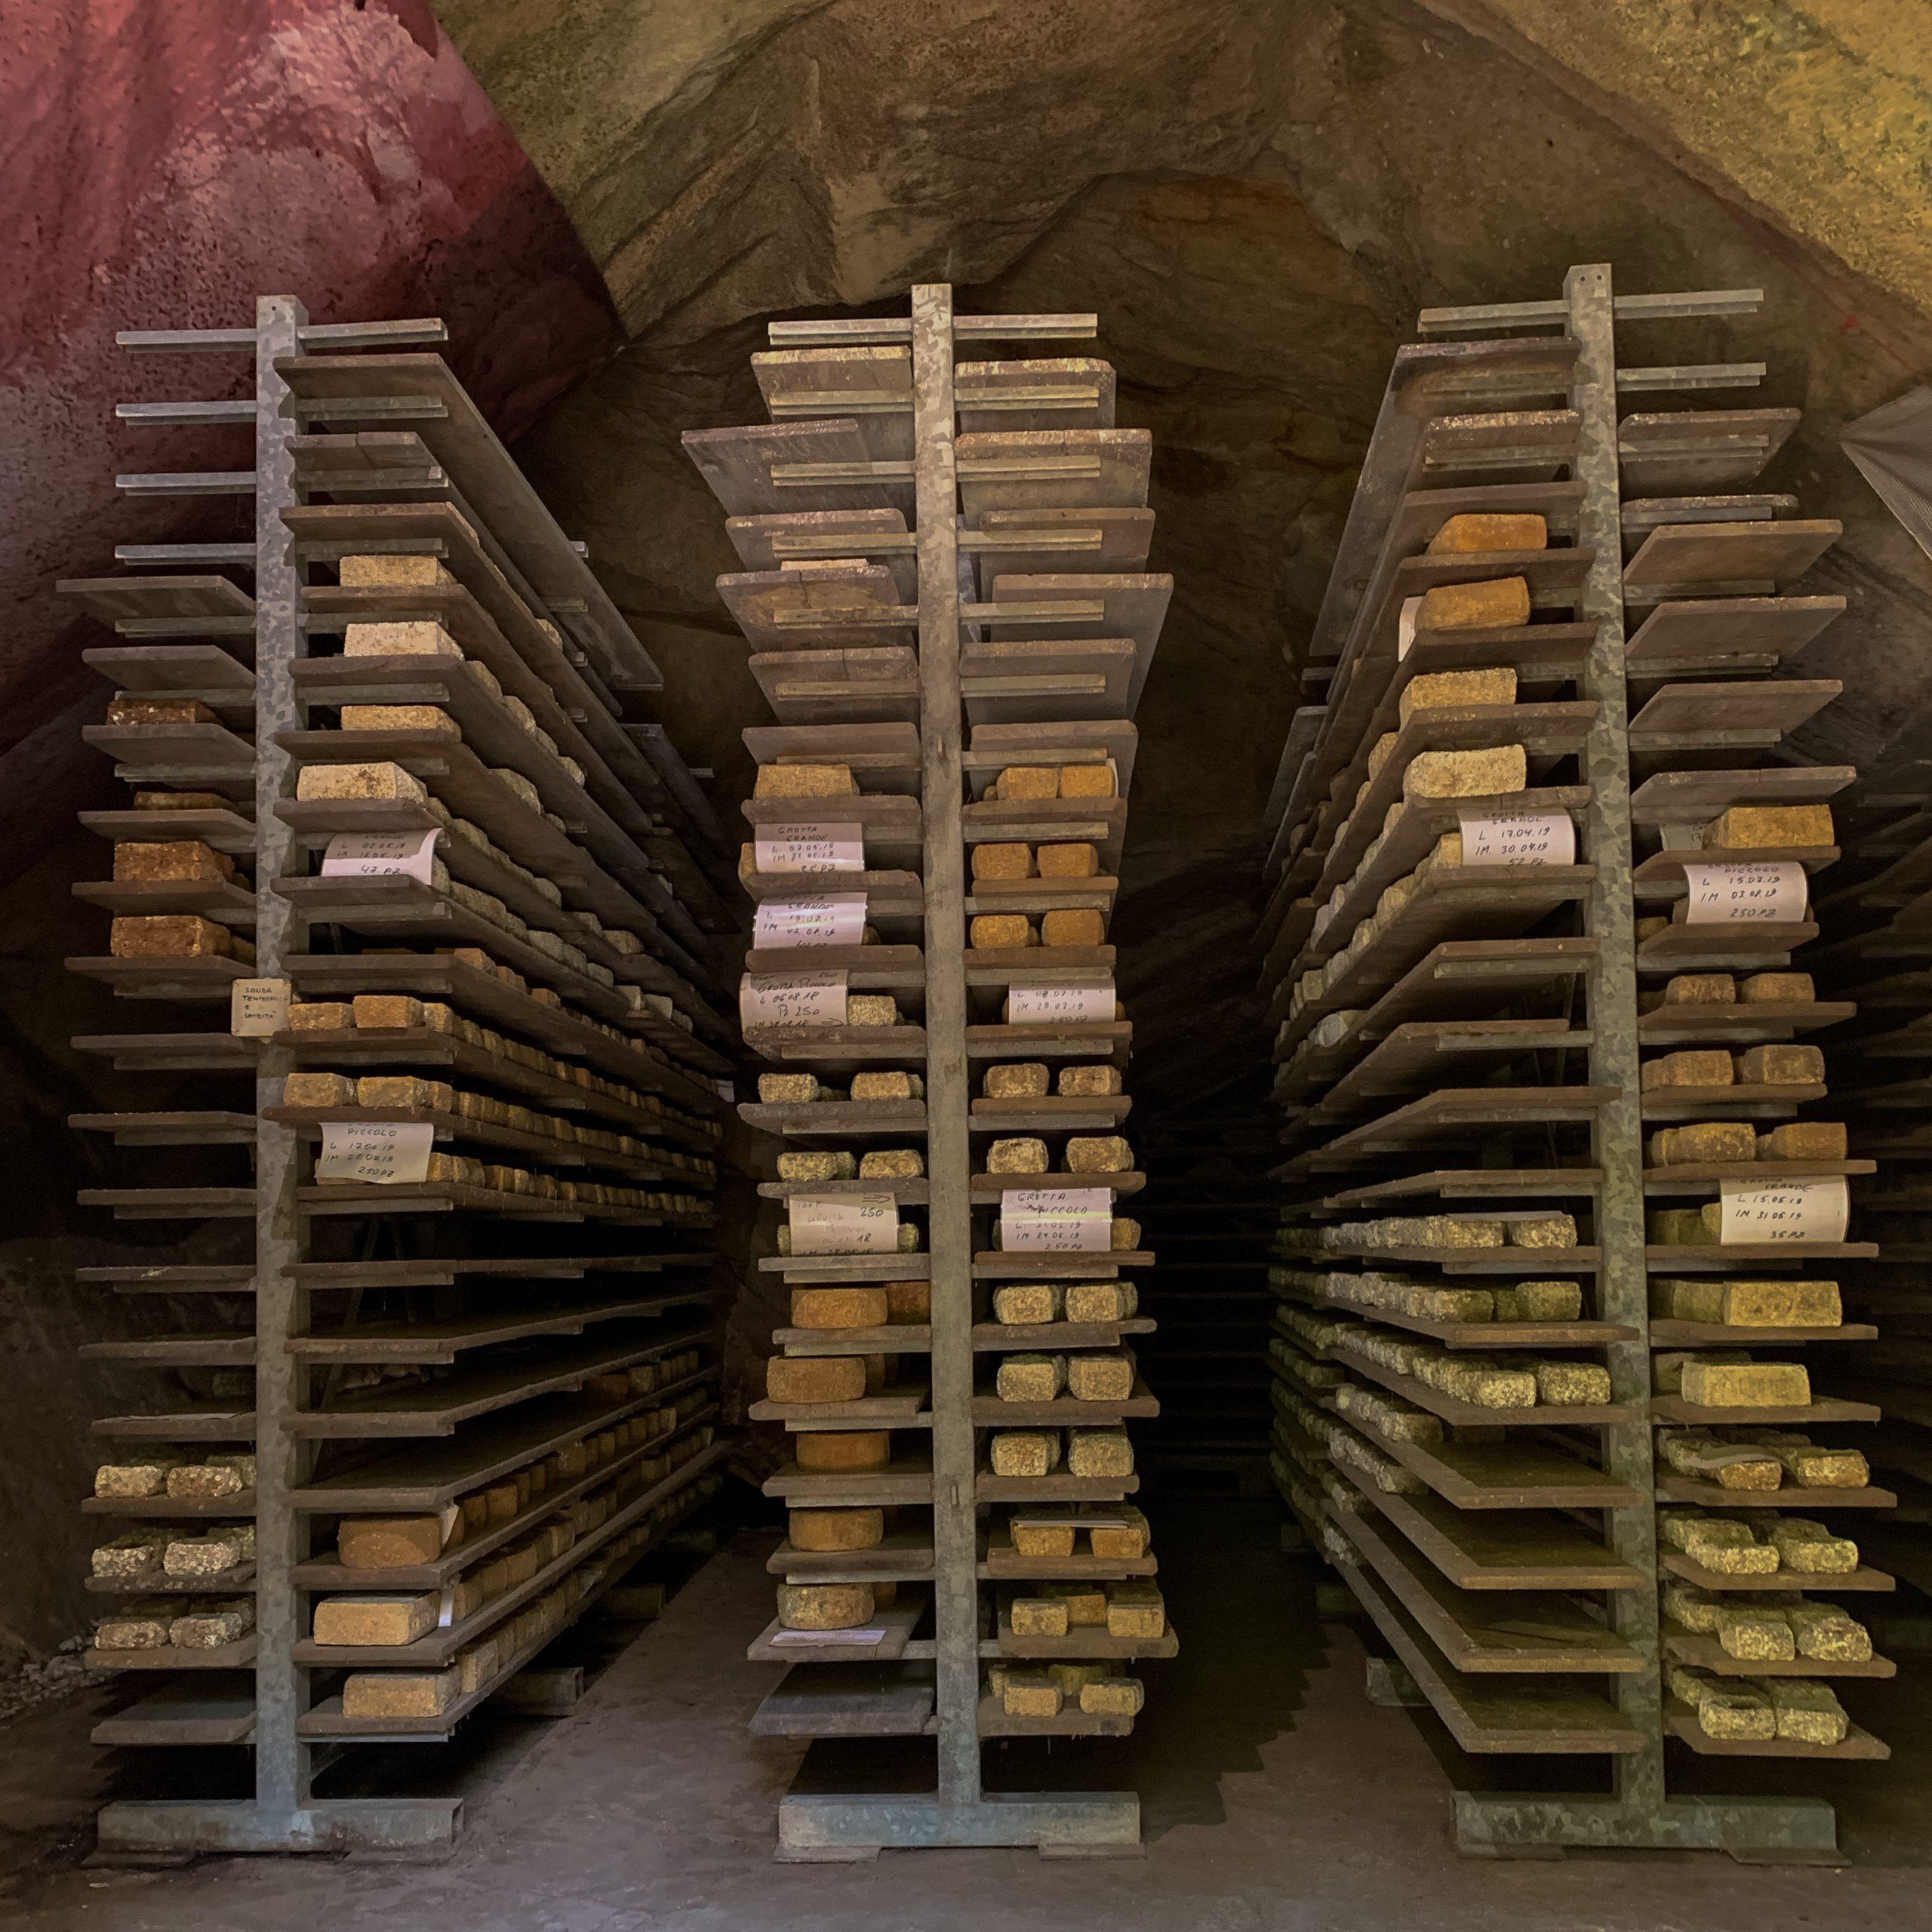 Local Italy: Grotte del Caglieron